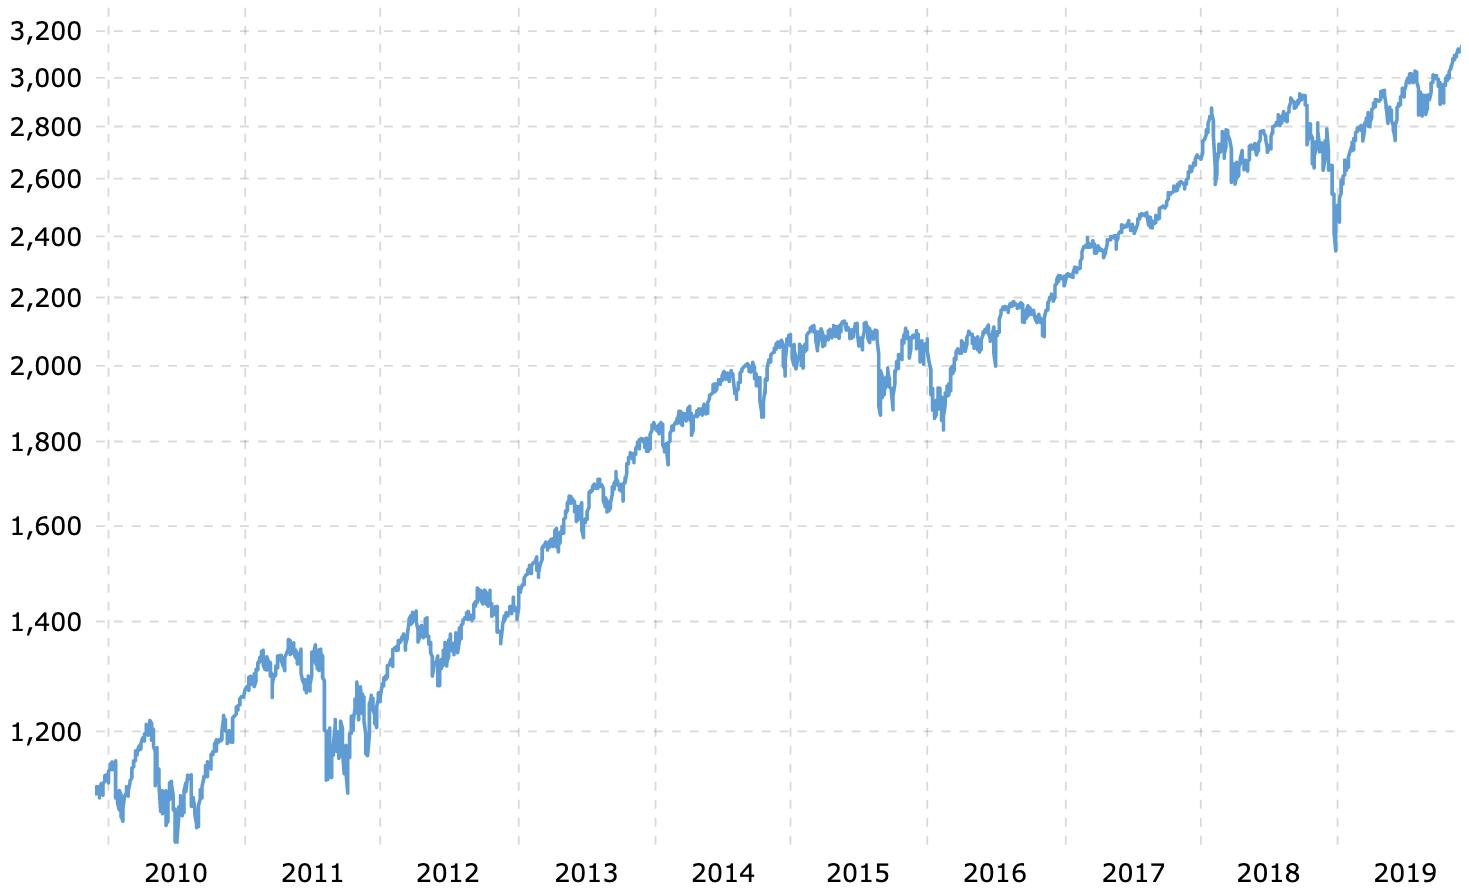 S&P 500 10-year bull market chart from 2009 - 2019